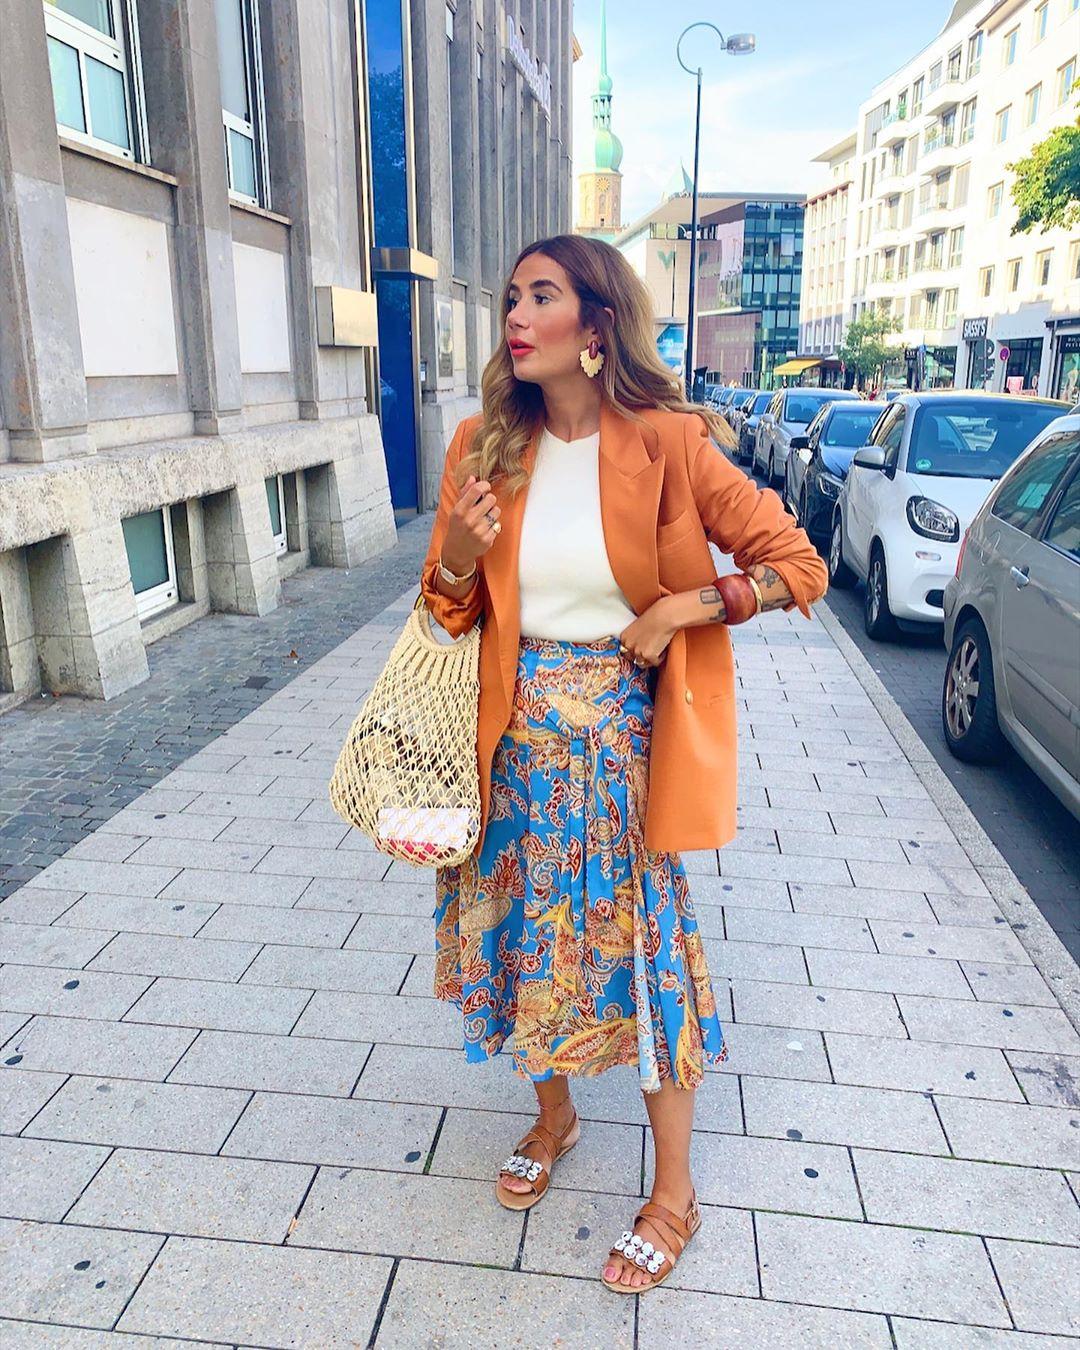 printed skirt with bow de Zara sur tataass_